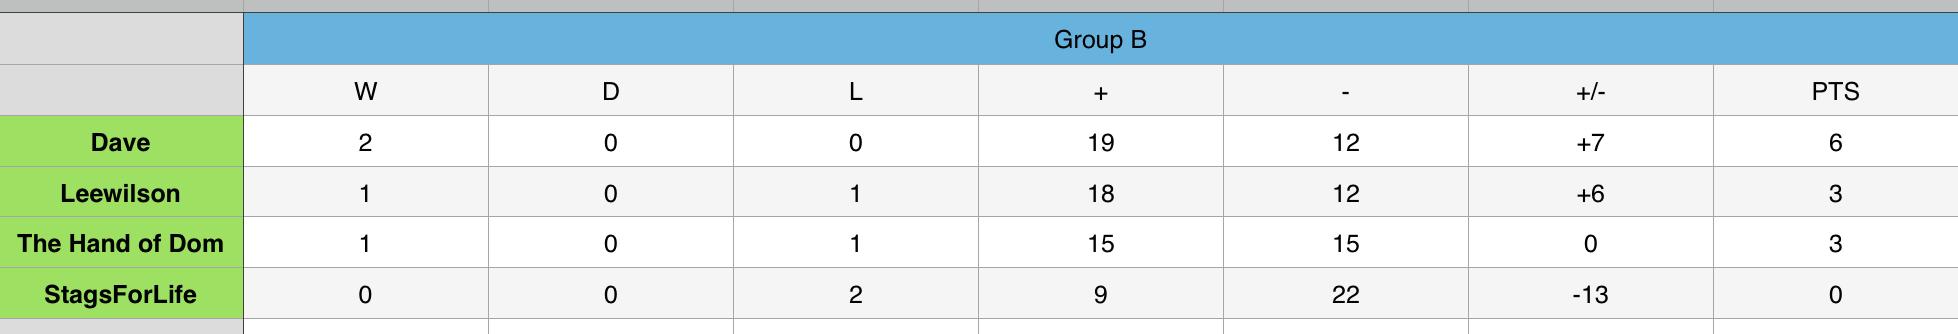 Group B 2.png